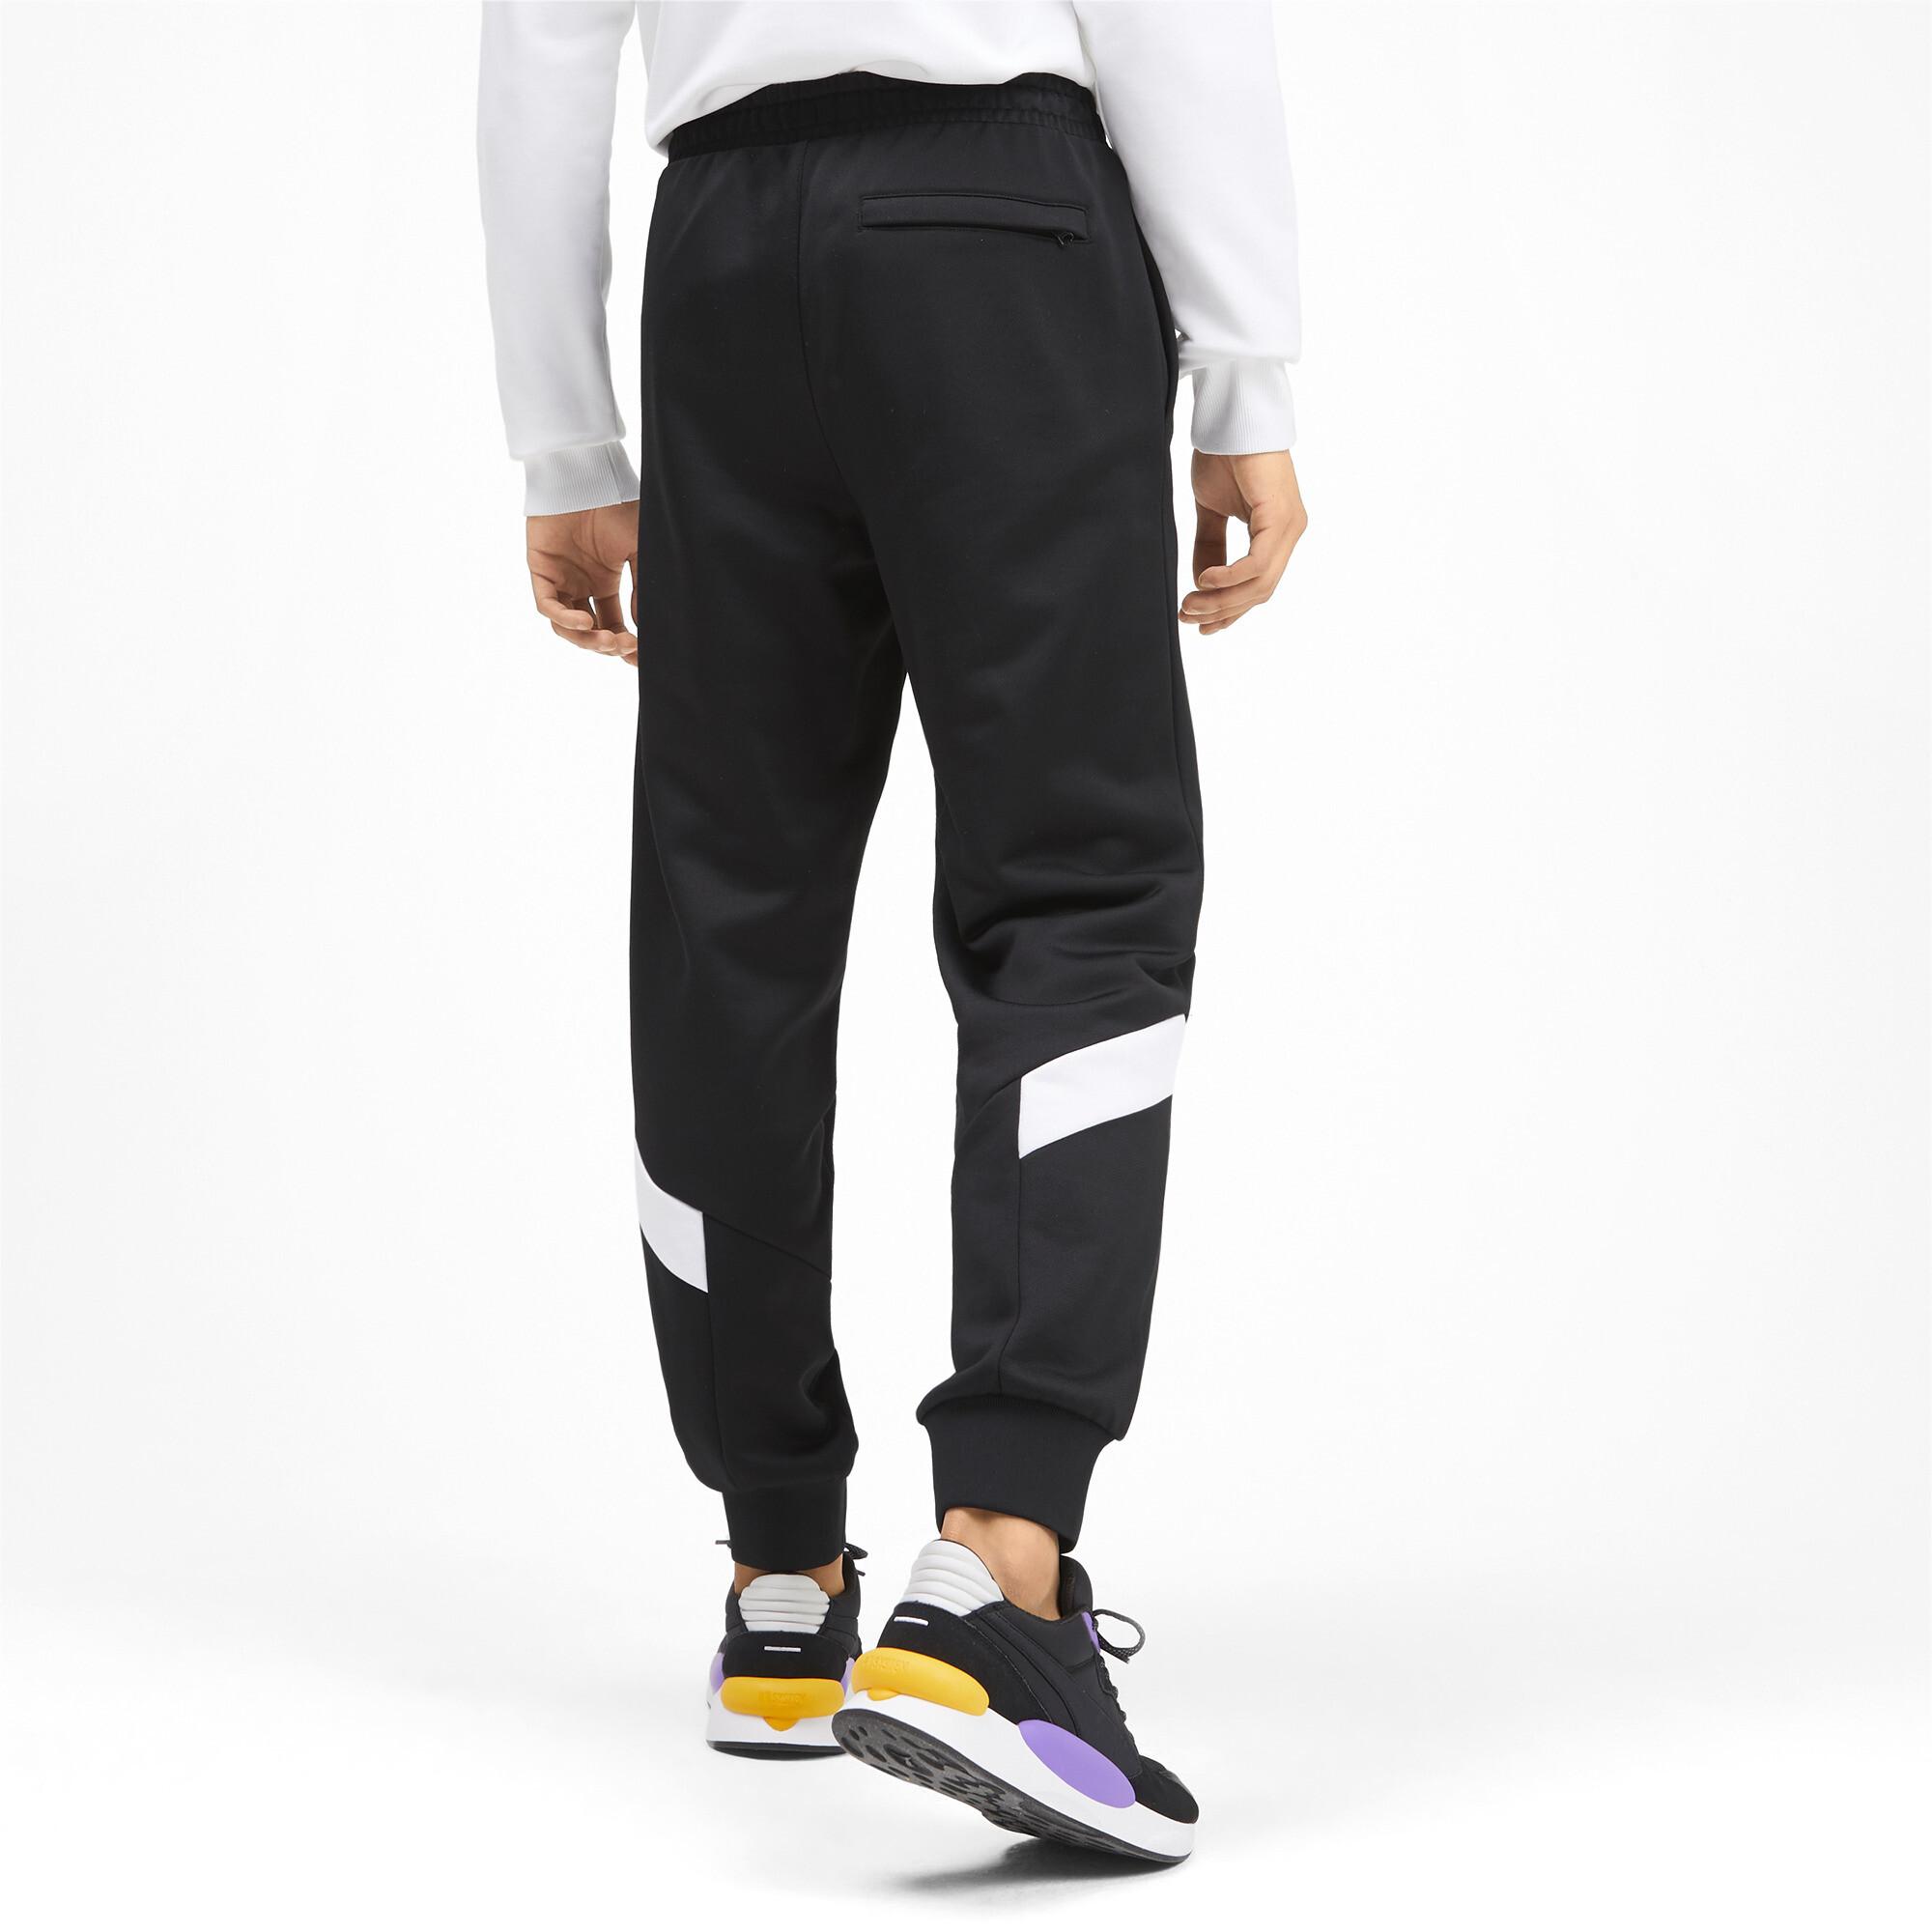 PUMA-Iconic-MCS-Men-039-s-Track-Pants-Men-Knitted-Pants-Sport-Classics thumbnail 10